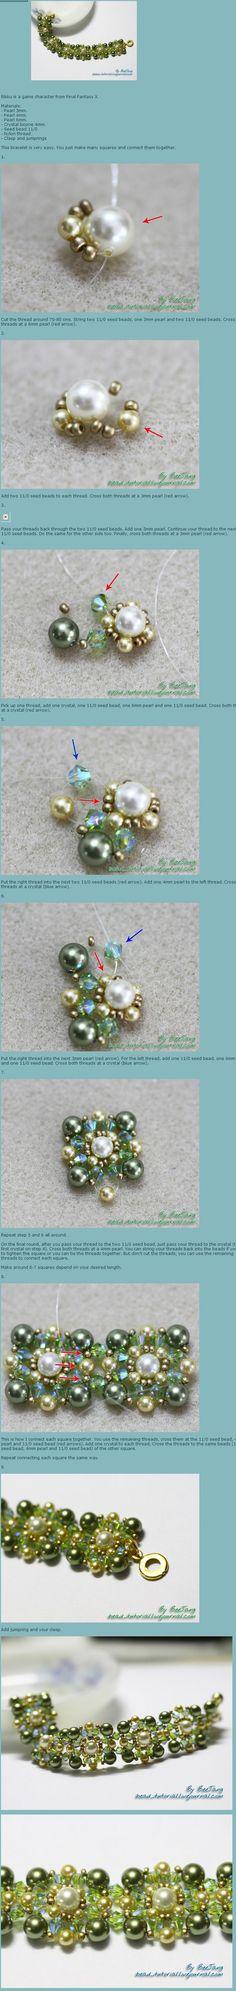 pretty beads craft!